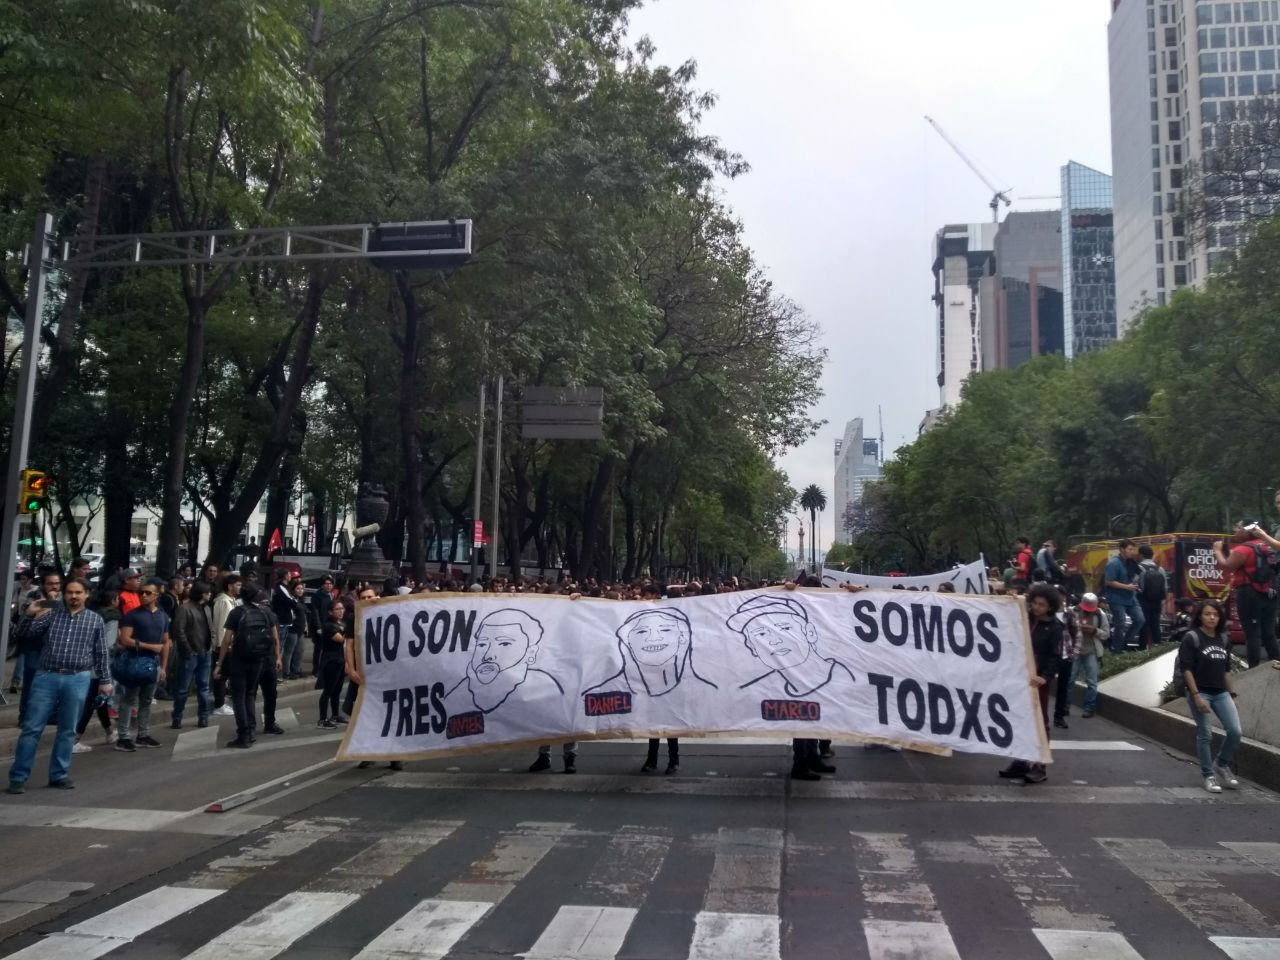 estudiantes durante marcha #nosontressomostodxs